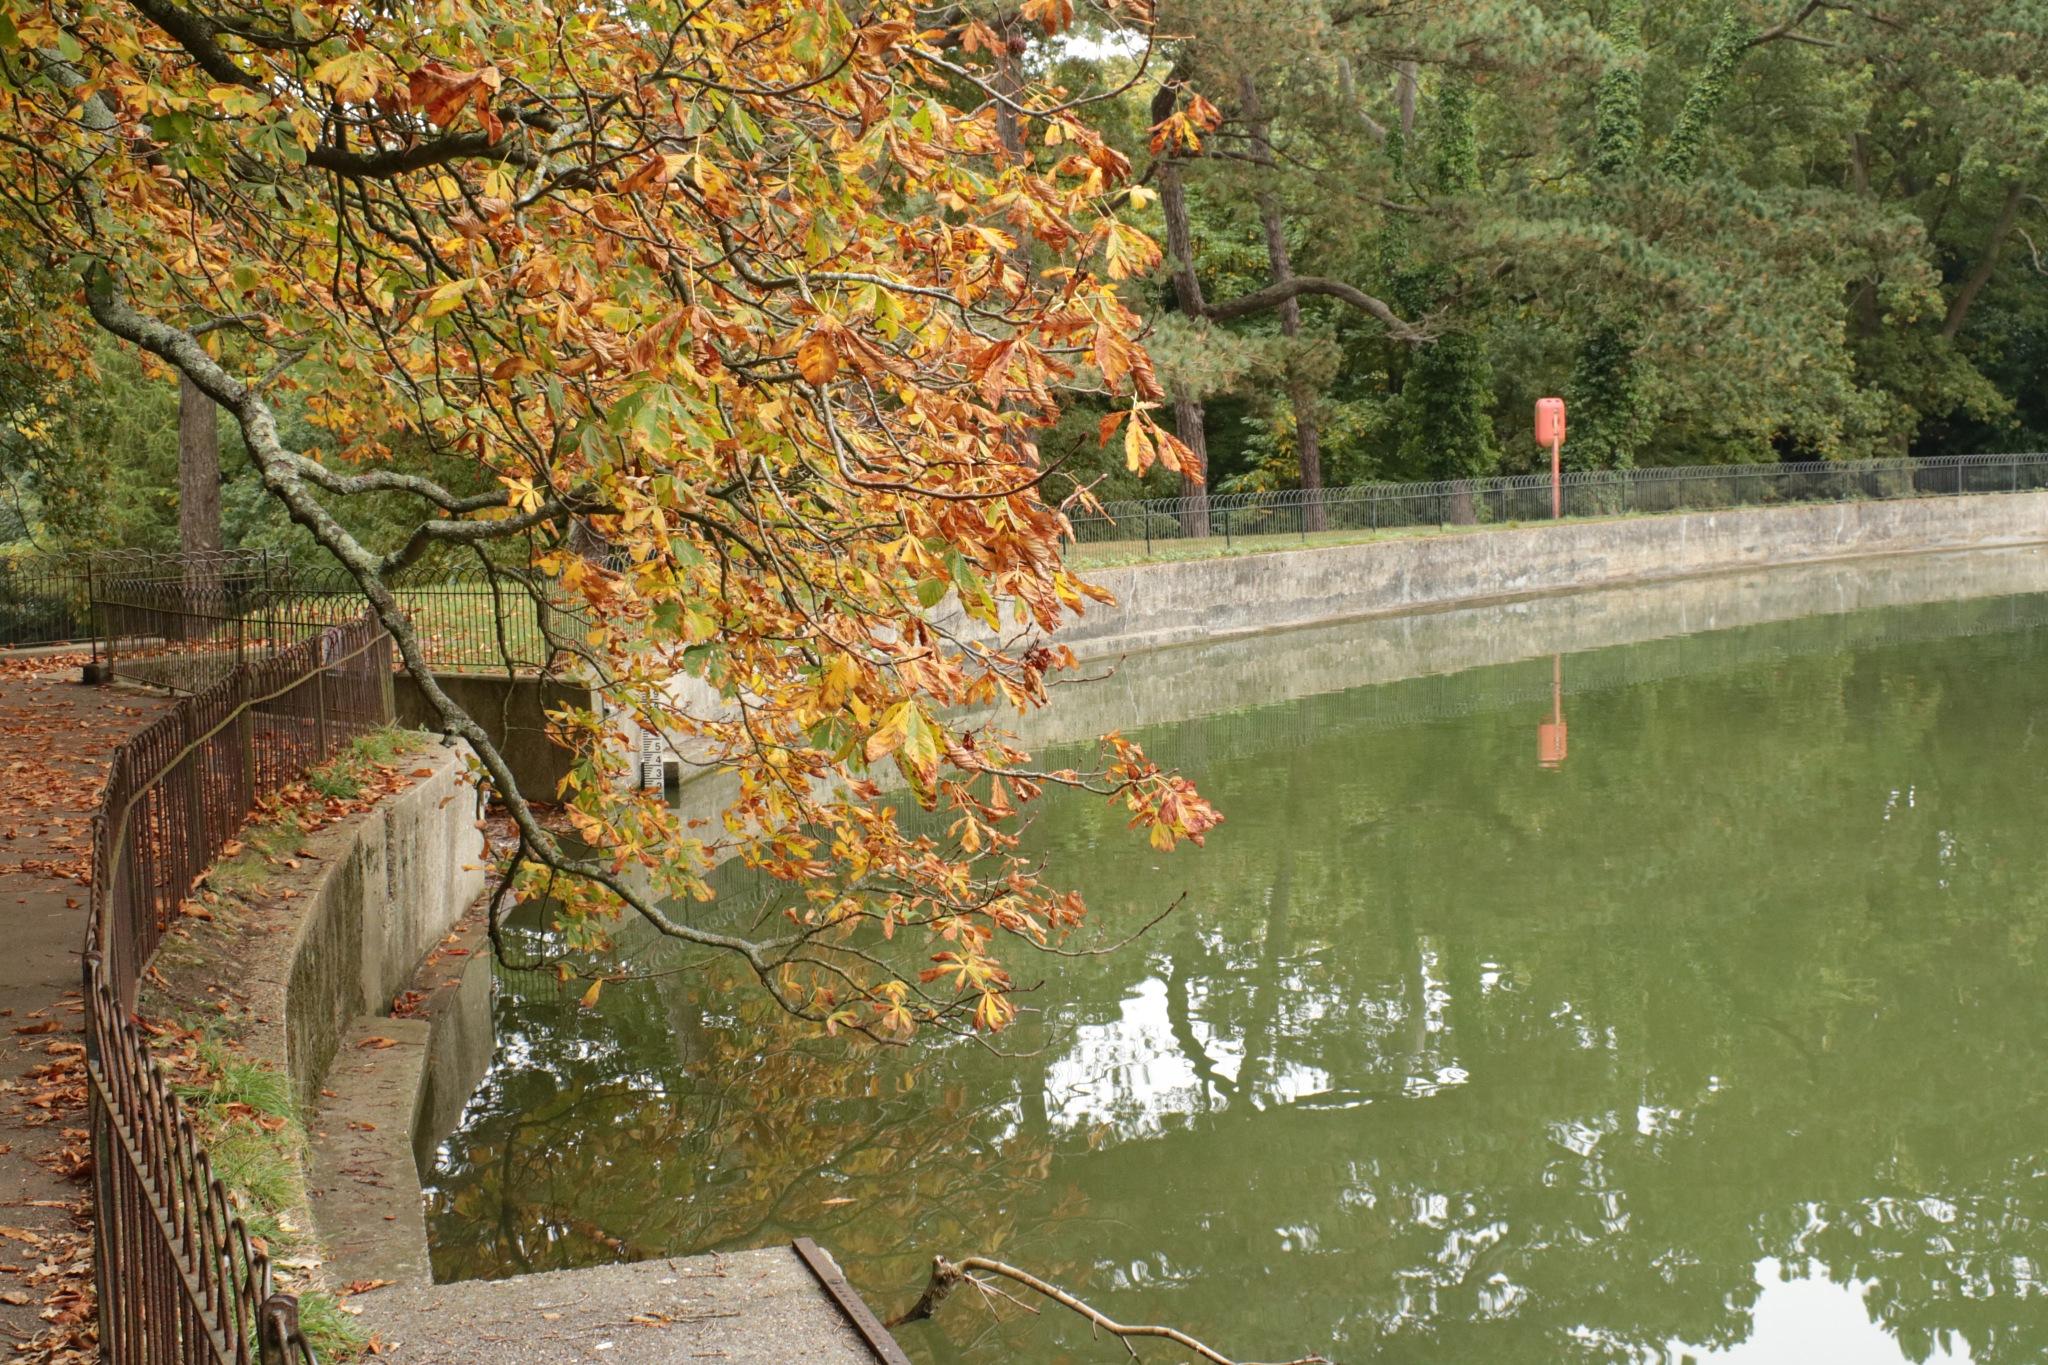 Autumn golden leaves, Alexandra Park by Mo Dessouki